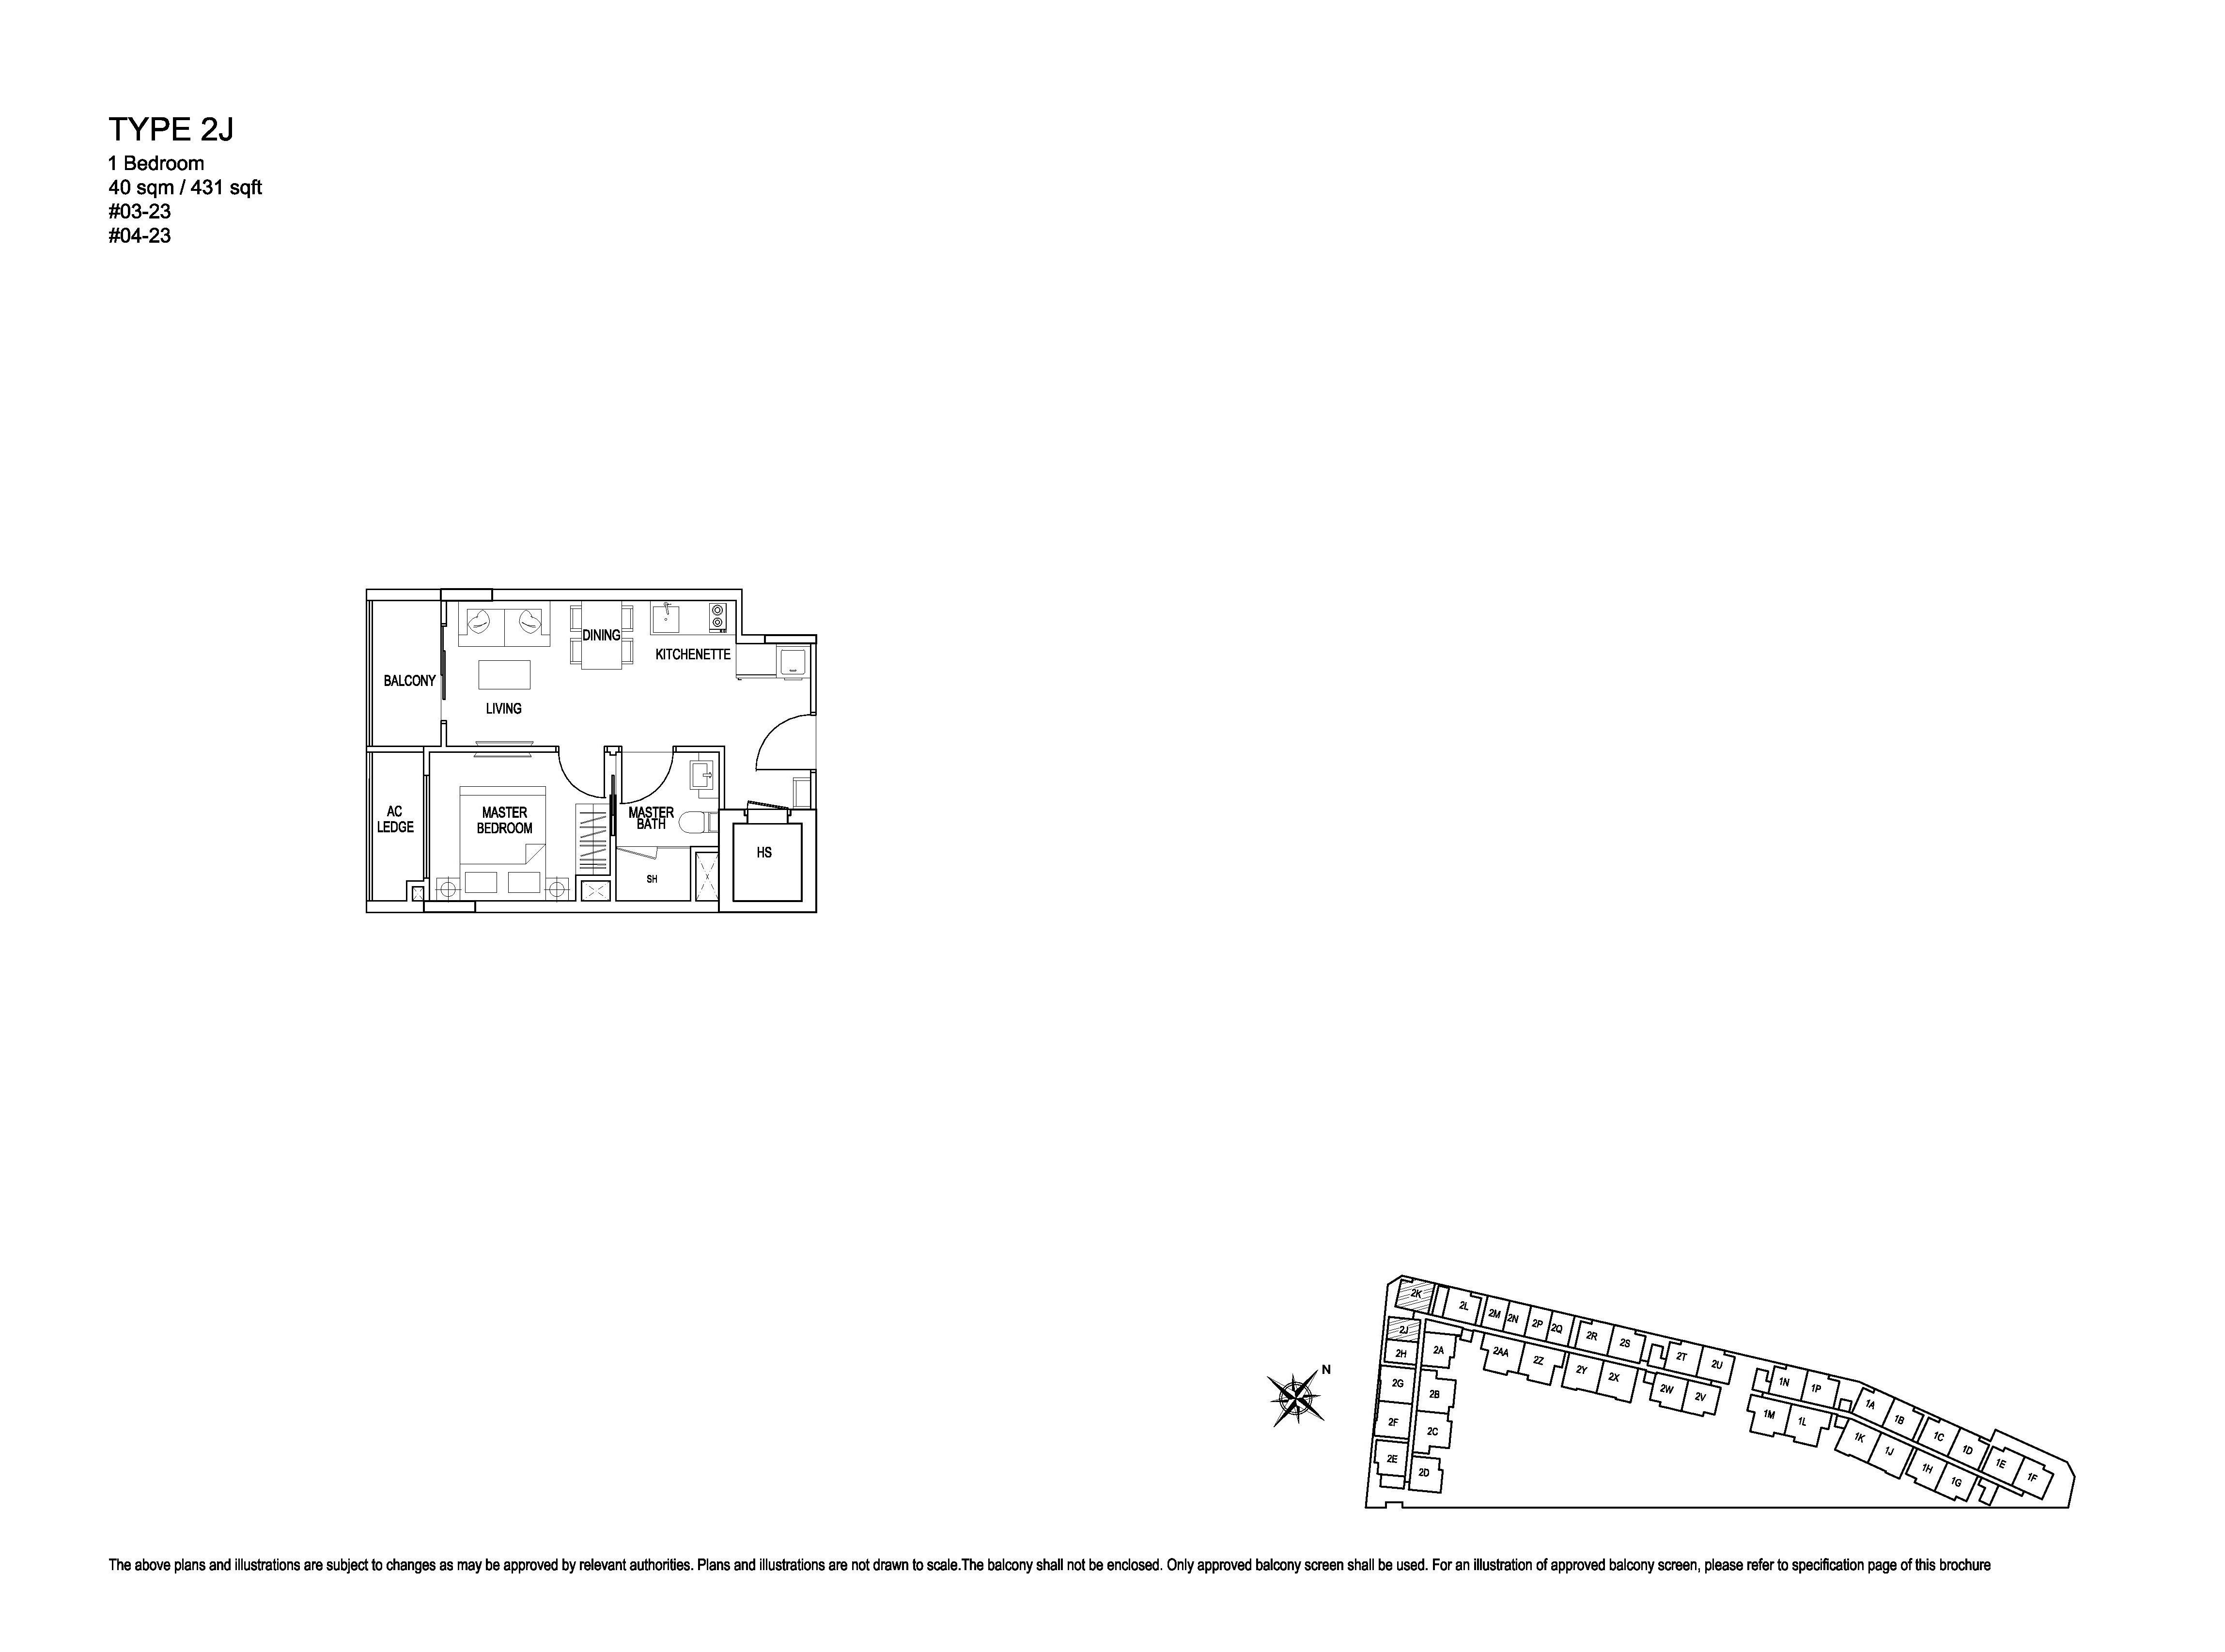 Kensington Square 1 Bedroom Floor Plans Type 2J